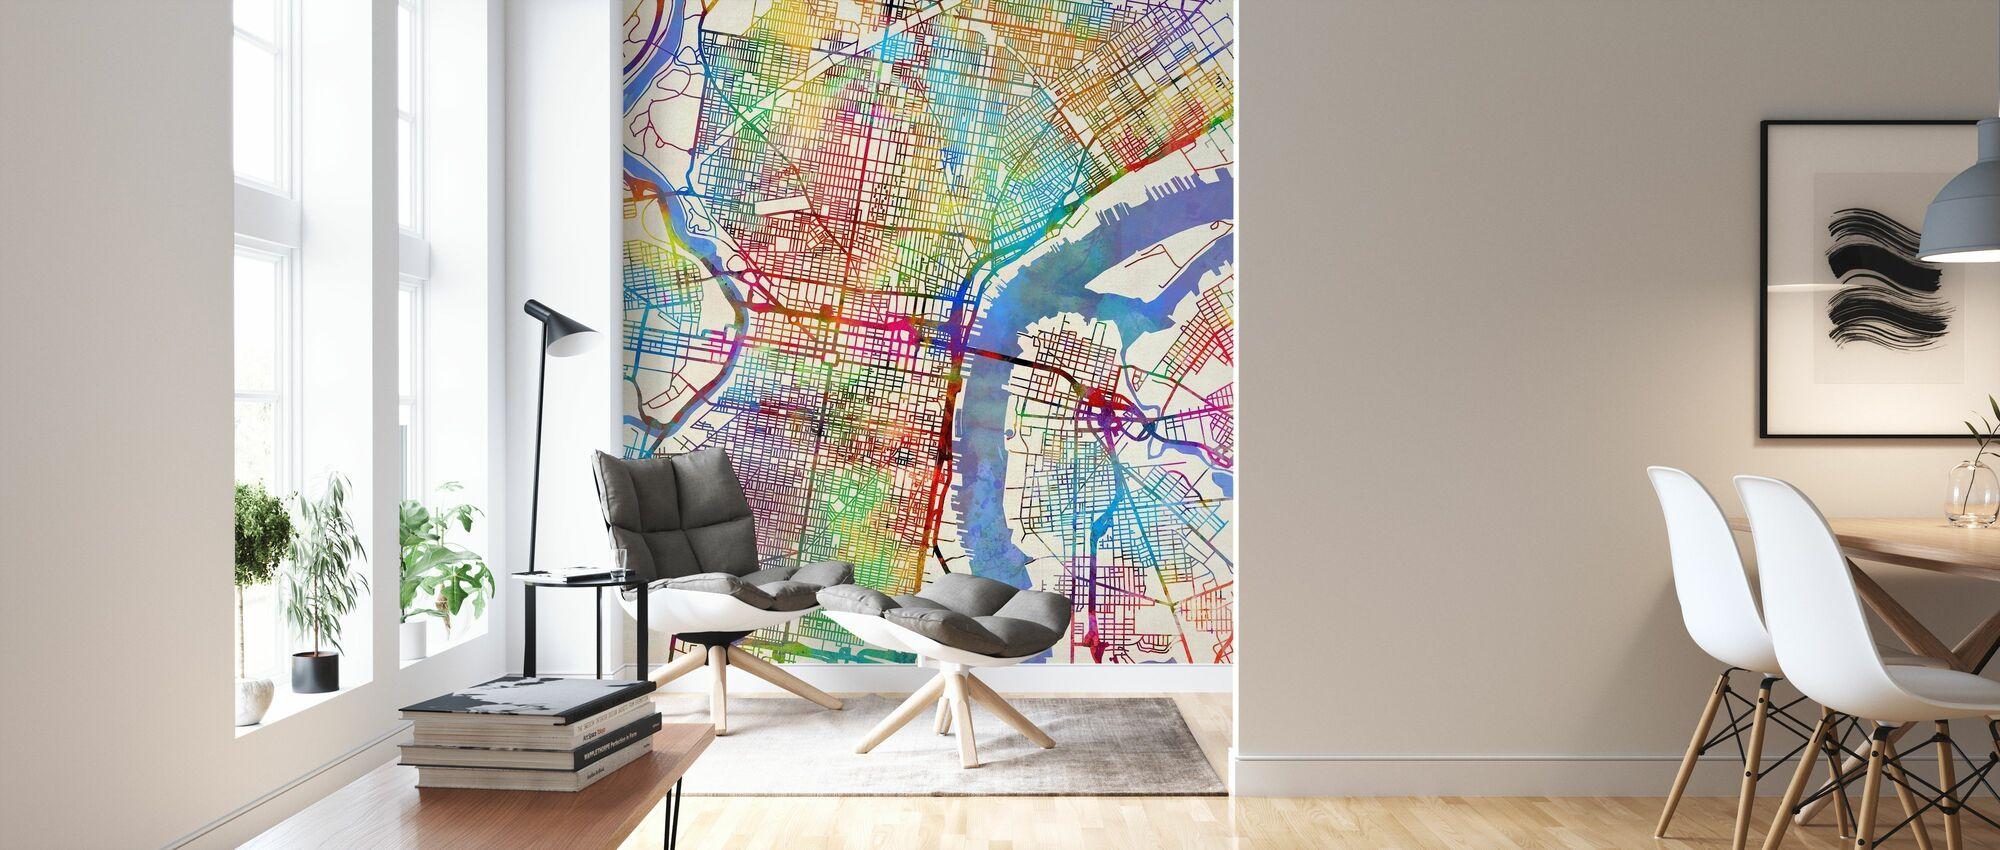 Philadelphia Pennsylvania City Street Map - Wallpaper - Living Room